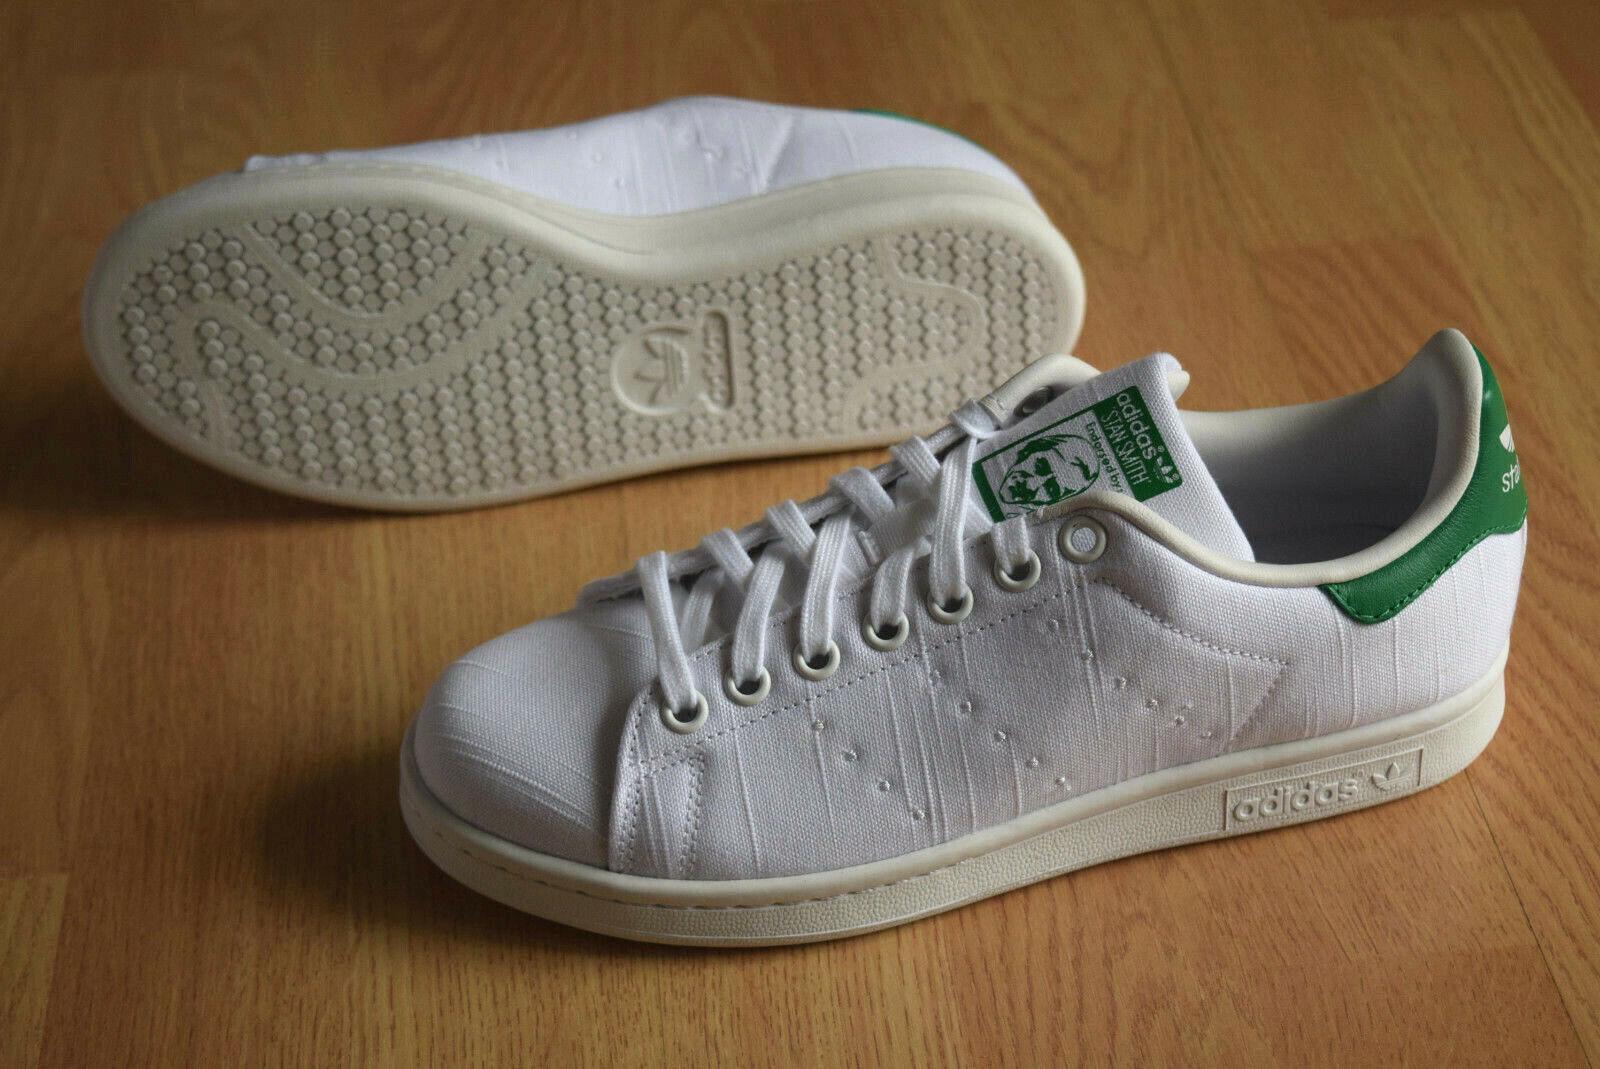 Adidas Stan Smith W 36,5 38 38,5 Toile S75560 Gazelle Superstar Continental